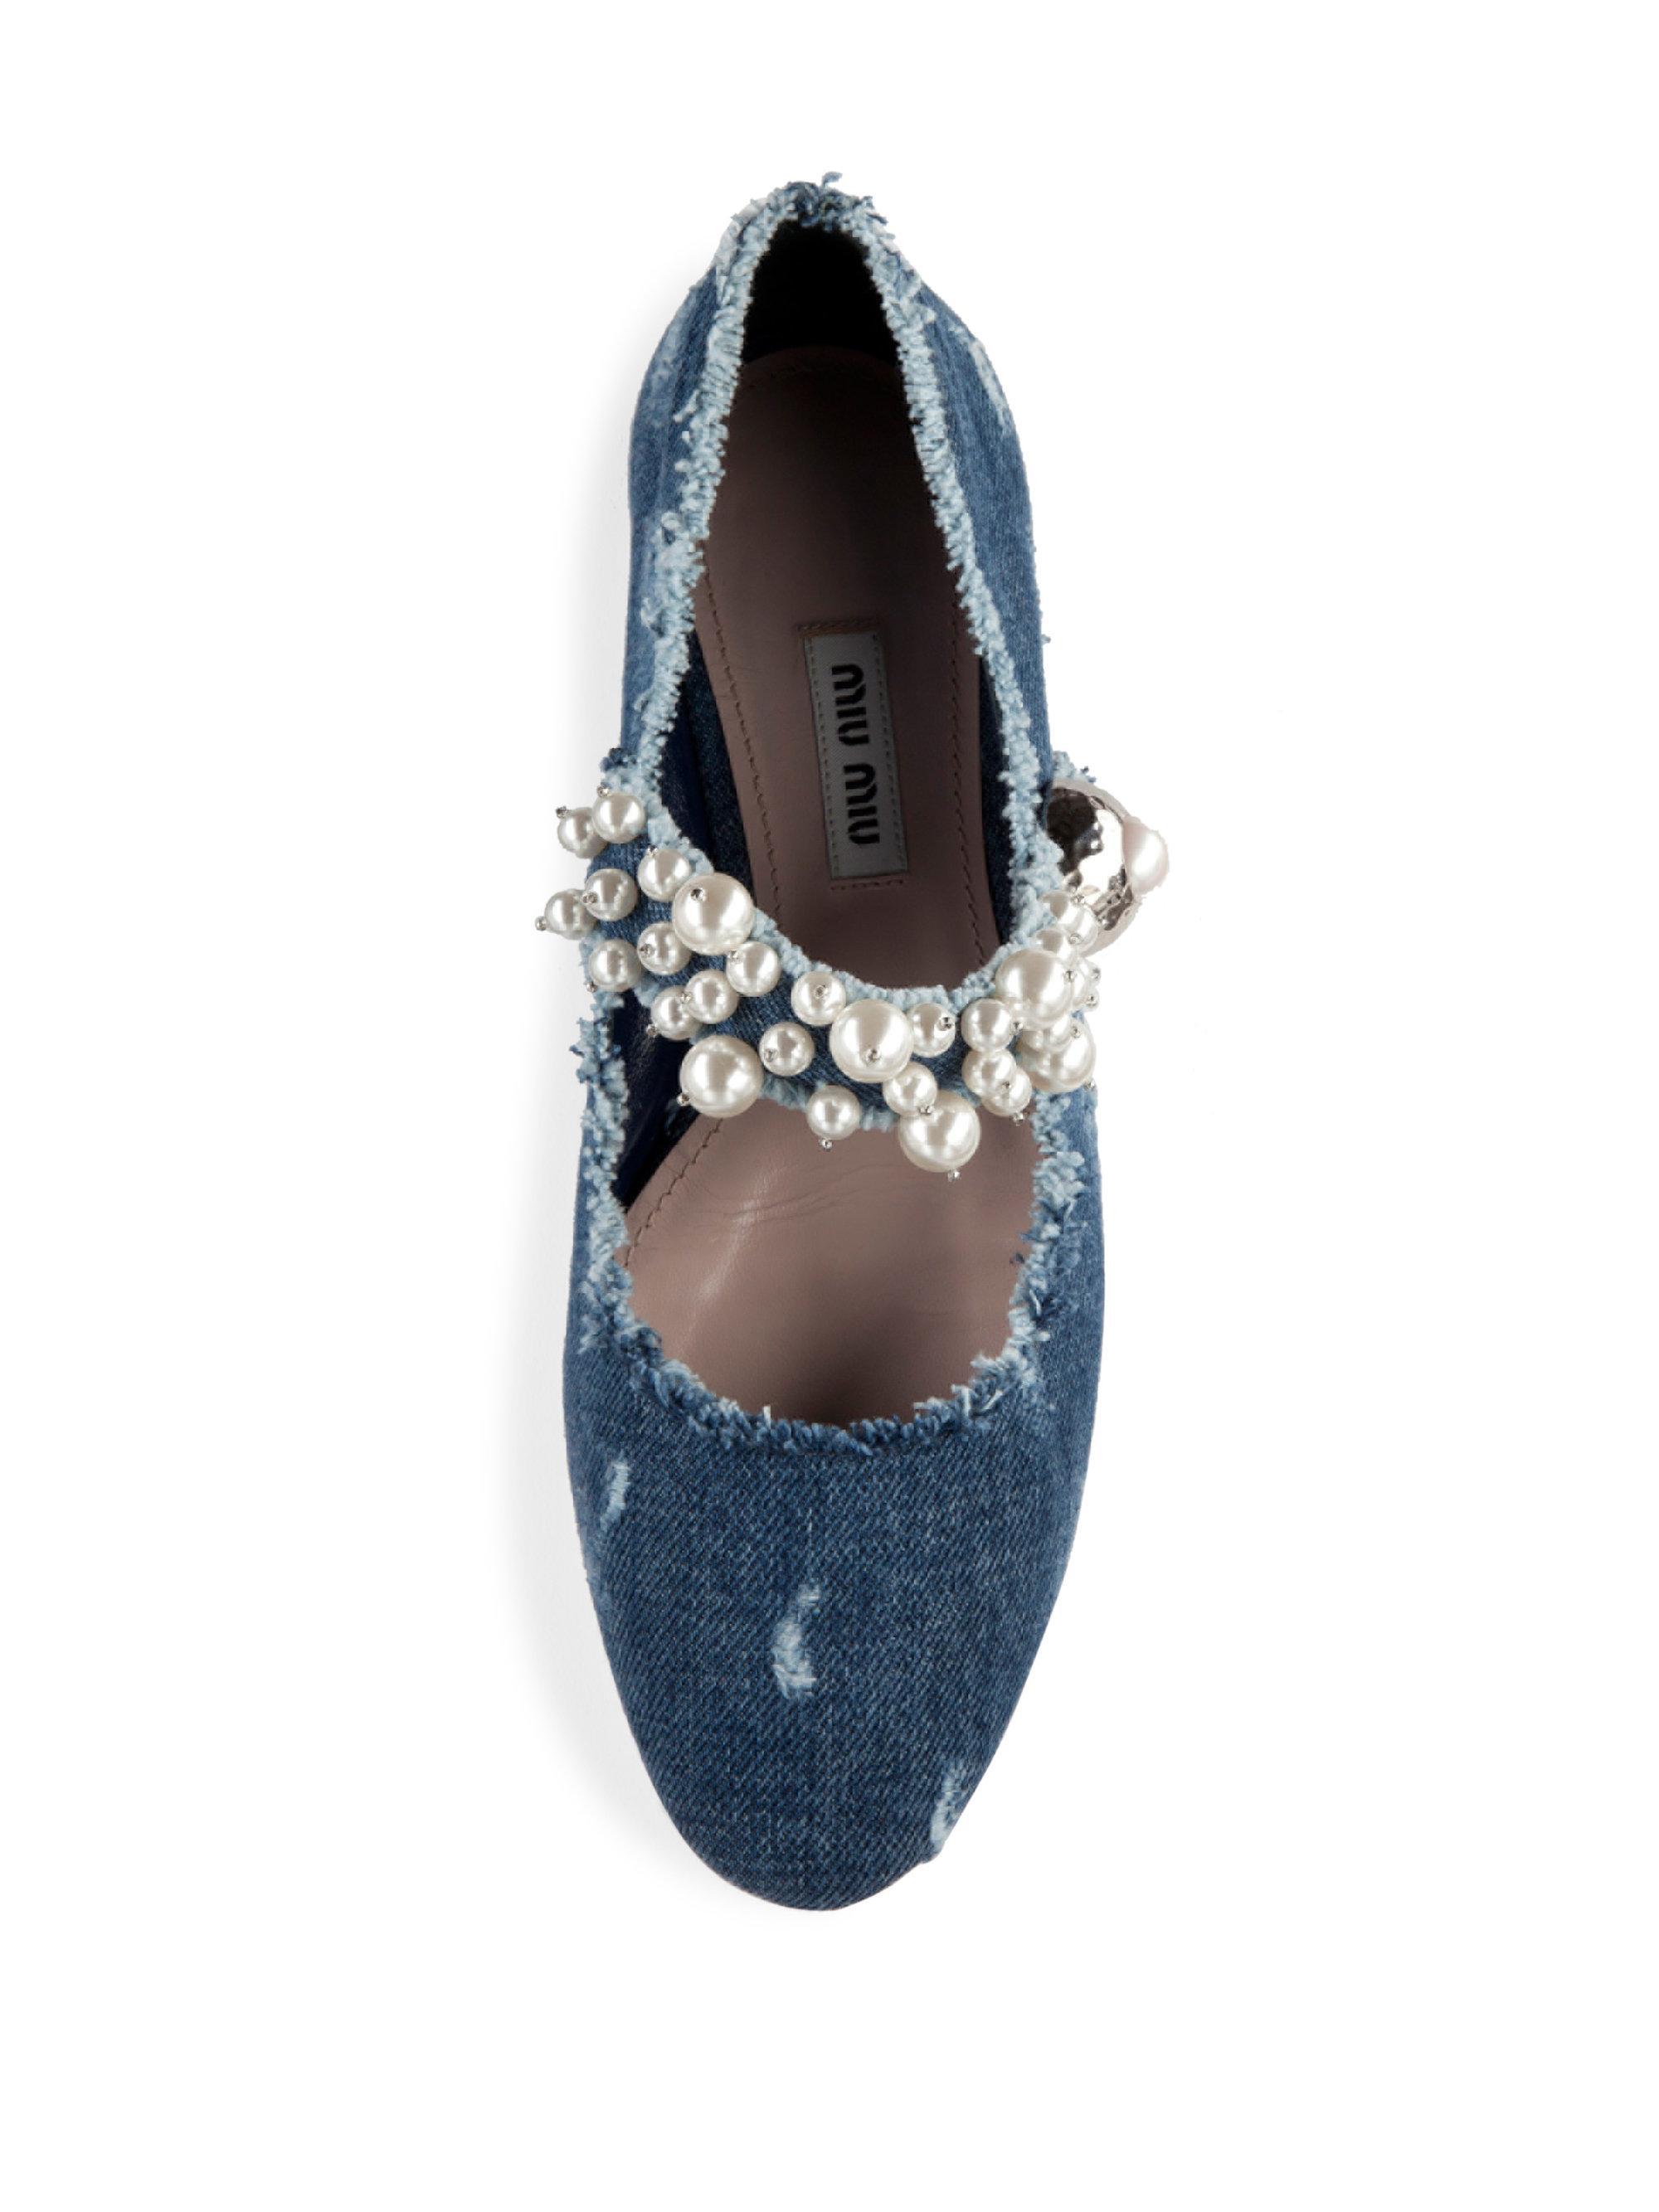 a11cf946c37b0 ... Lyst - Miu Miu Pearl Bead Trim Frayed Denim Mary Jane Flats in Blue  most popular  Black Jelly Flats detailed pictures f1691 1f305  Tory Burch  ...